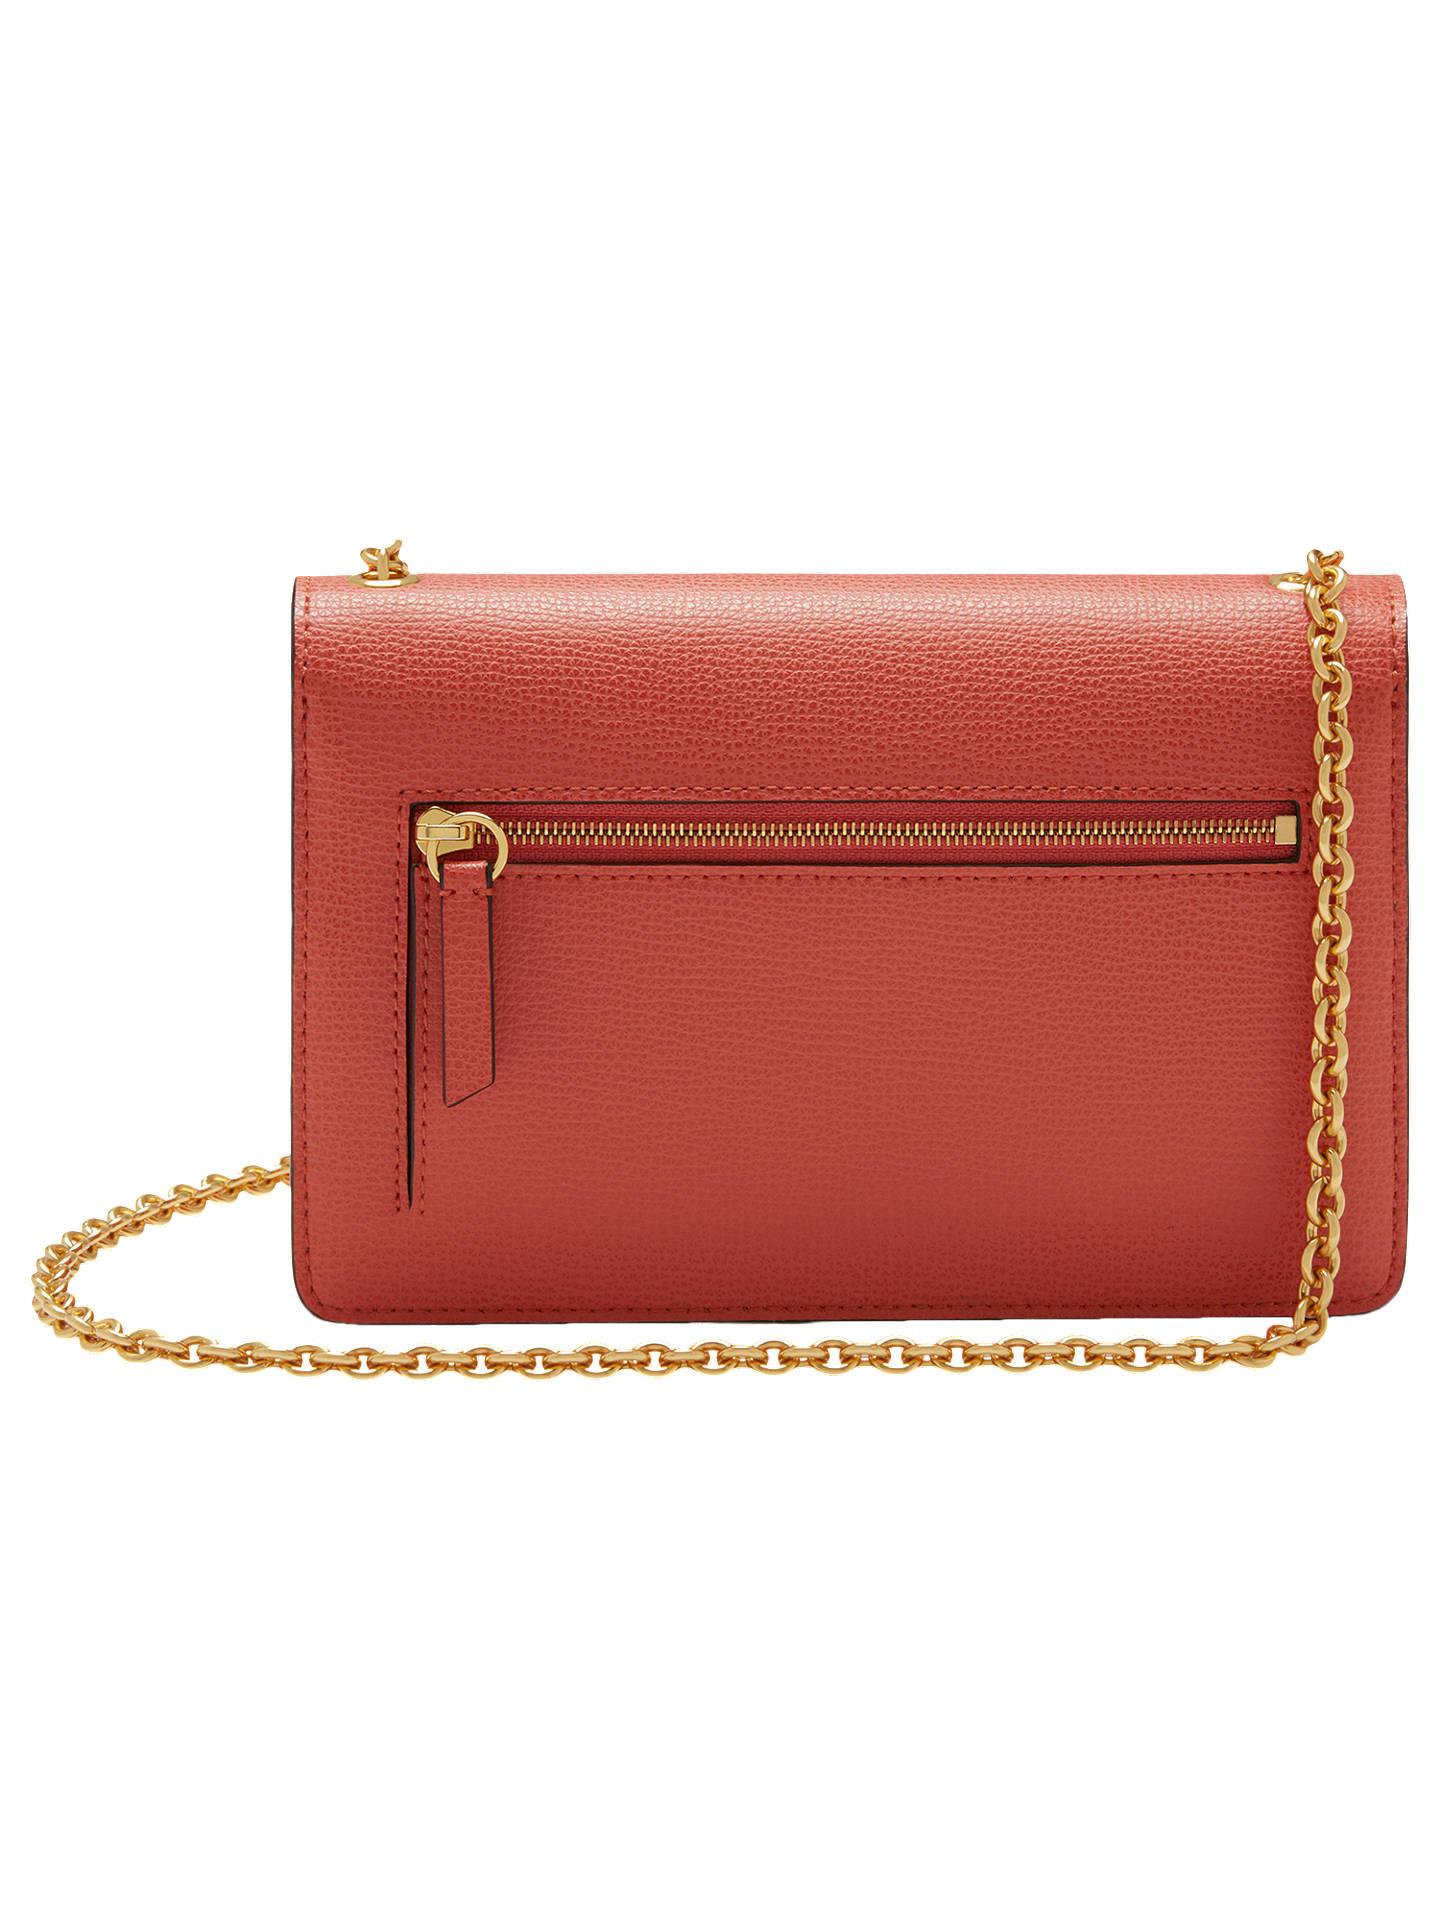 1146017db0 Buy Mulberry Darley Small Grain Leather Cross Body Bag